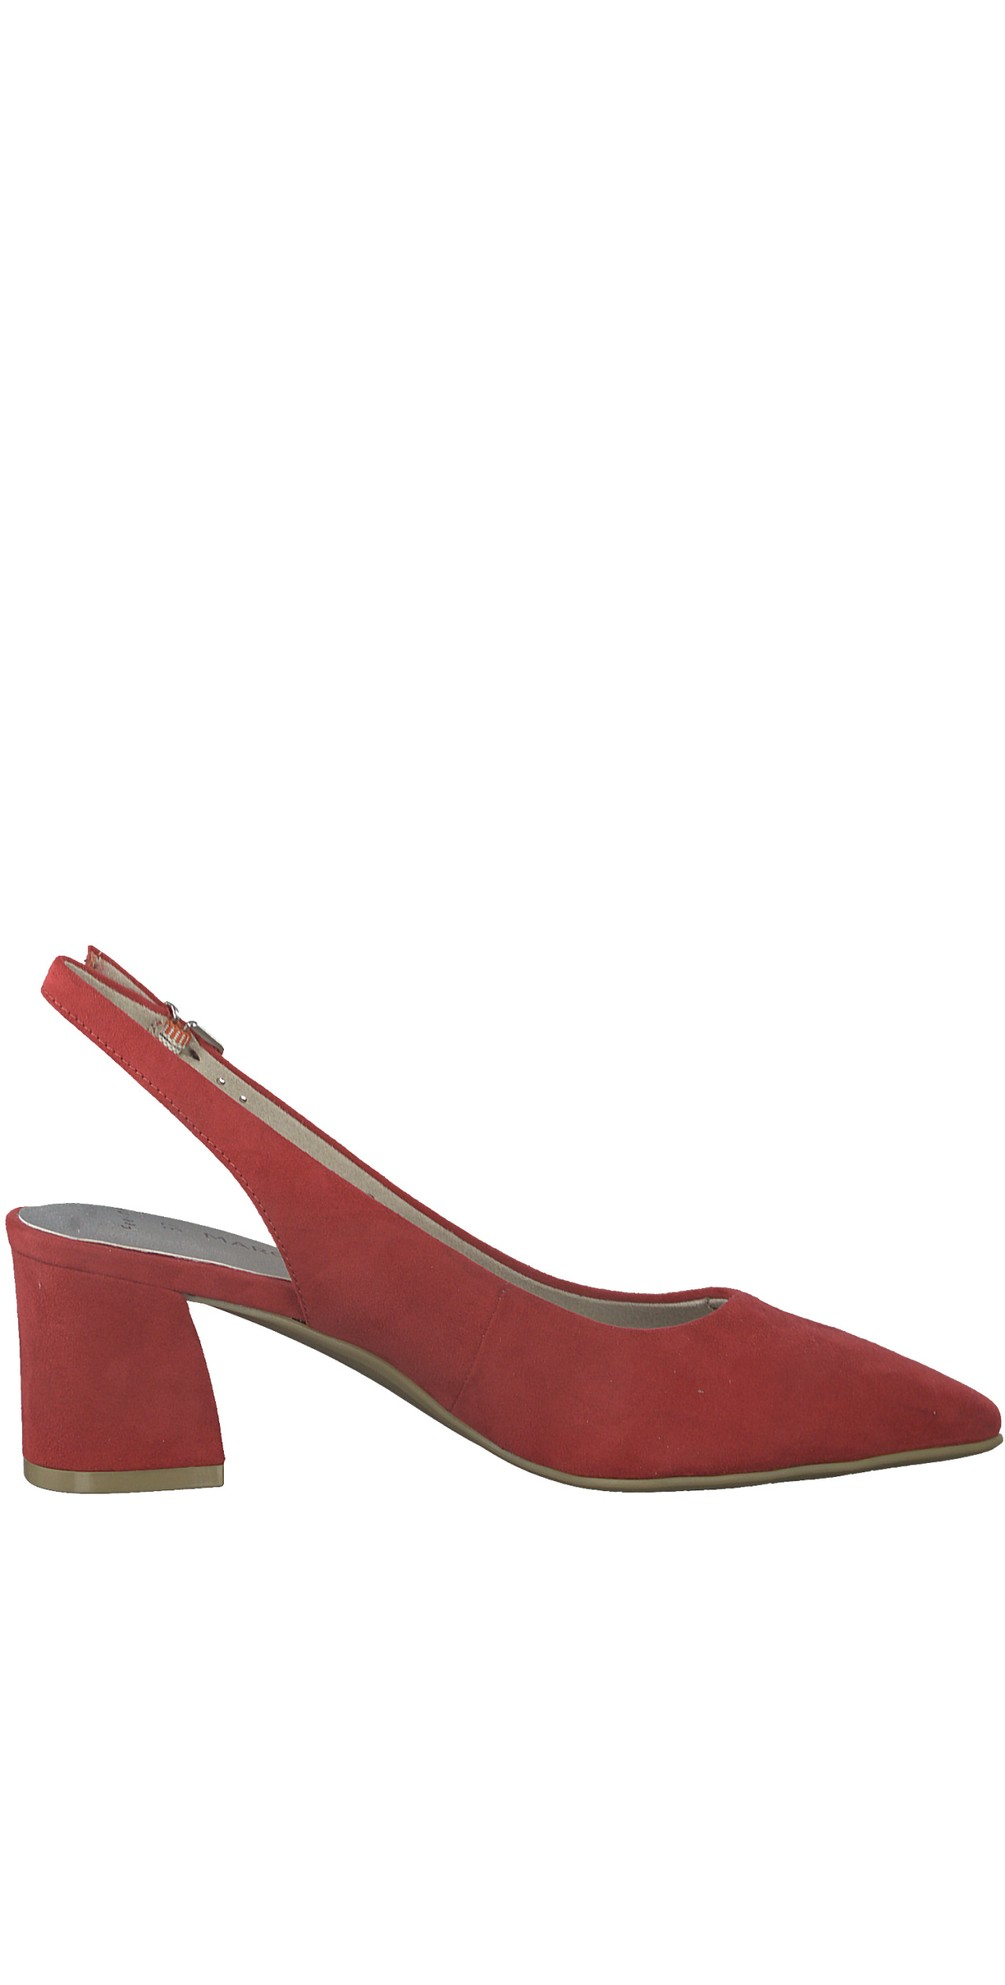 Rila Shoe main image